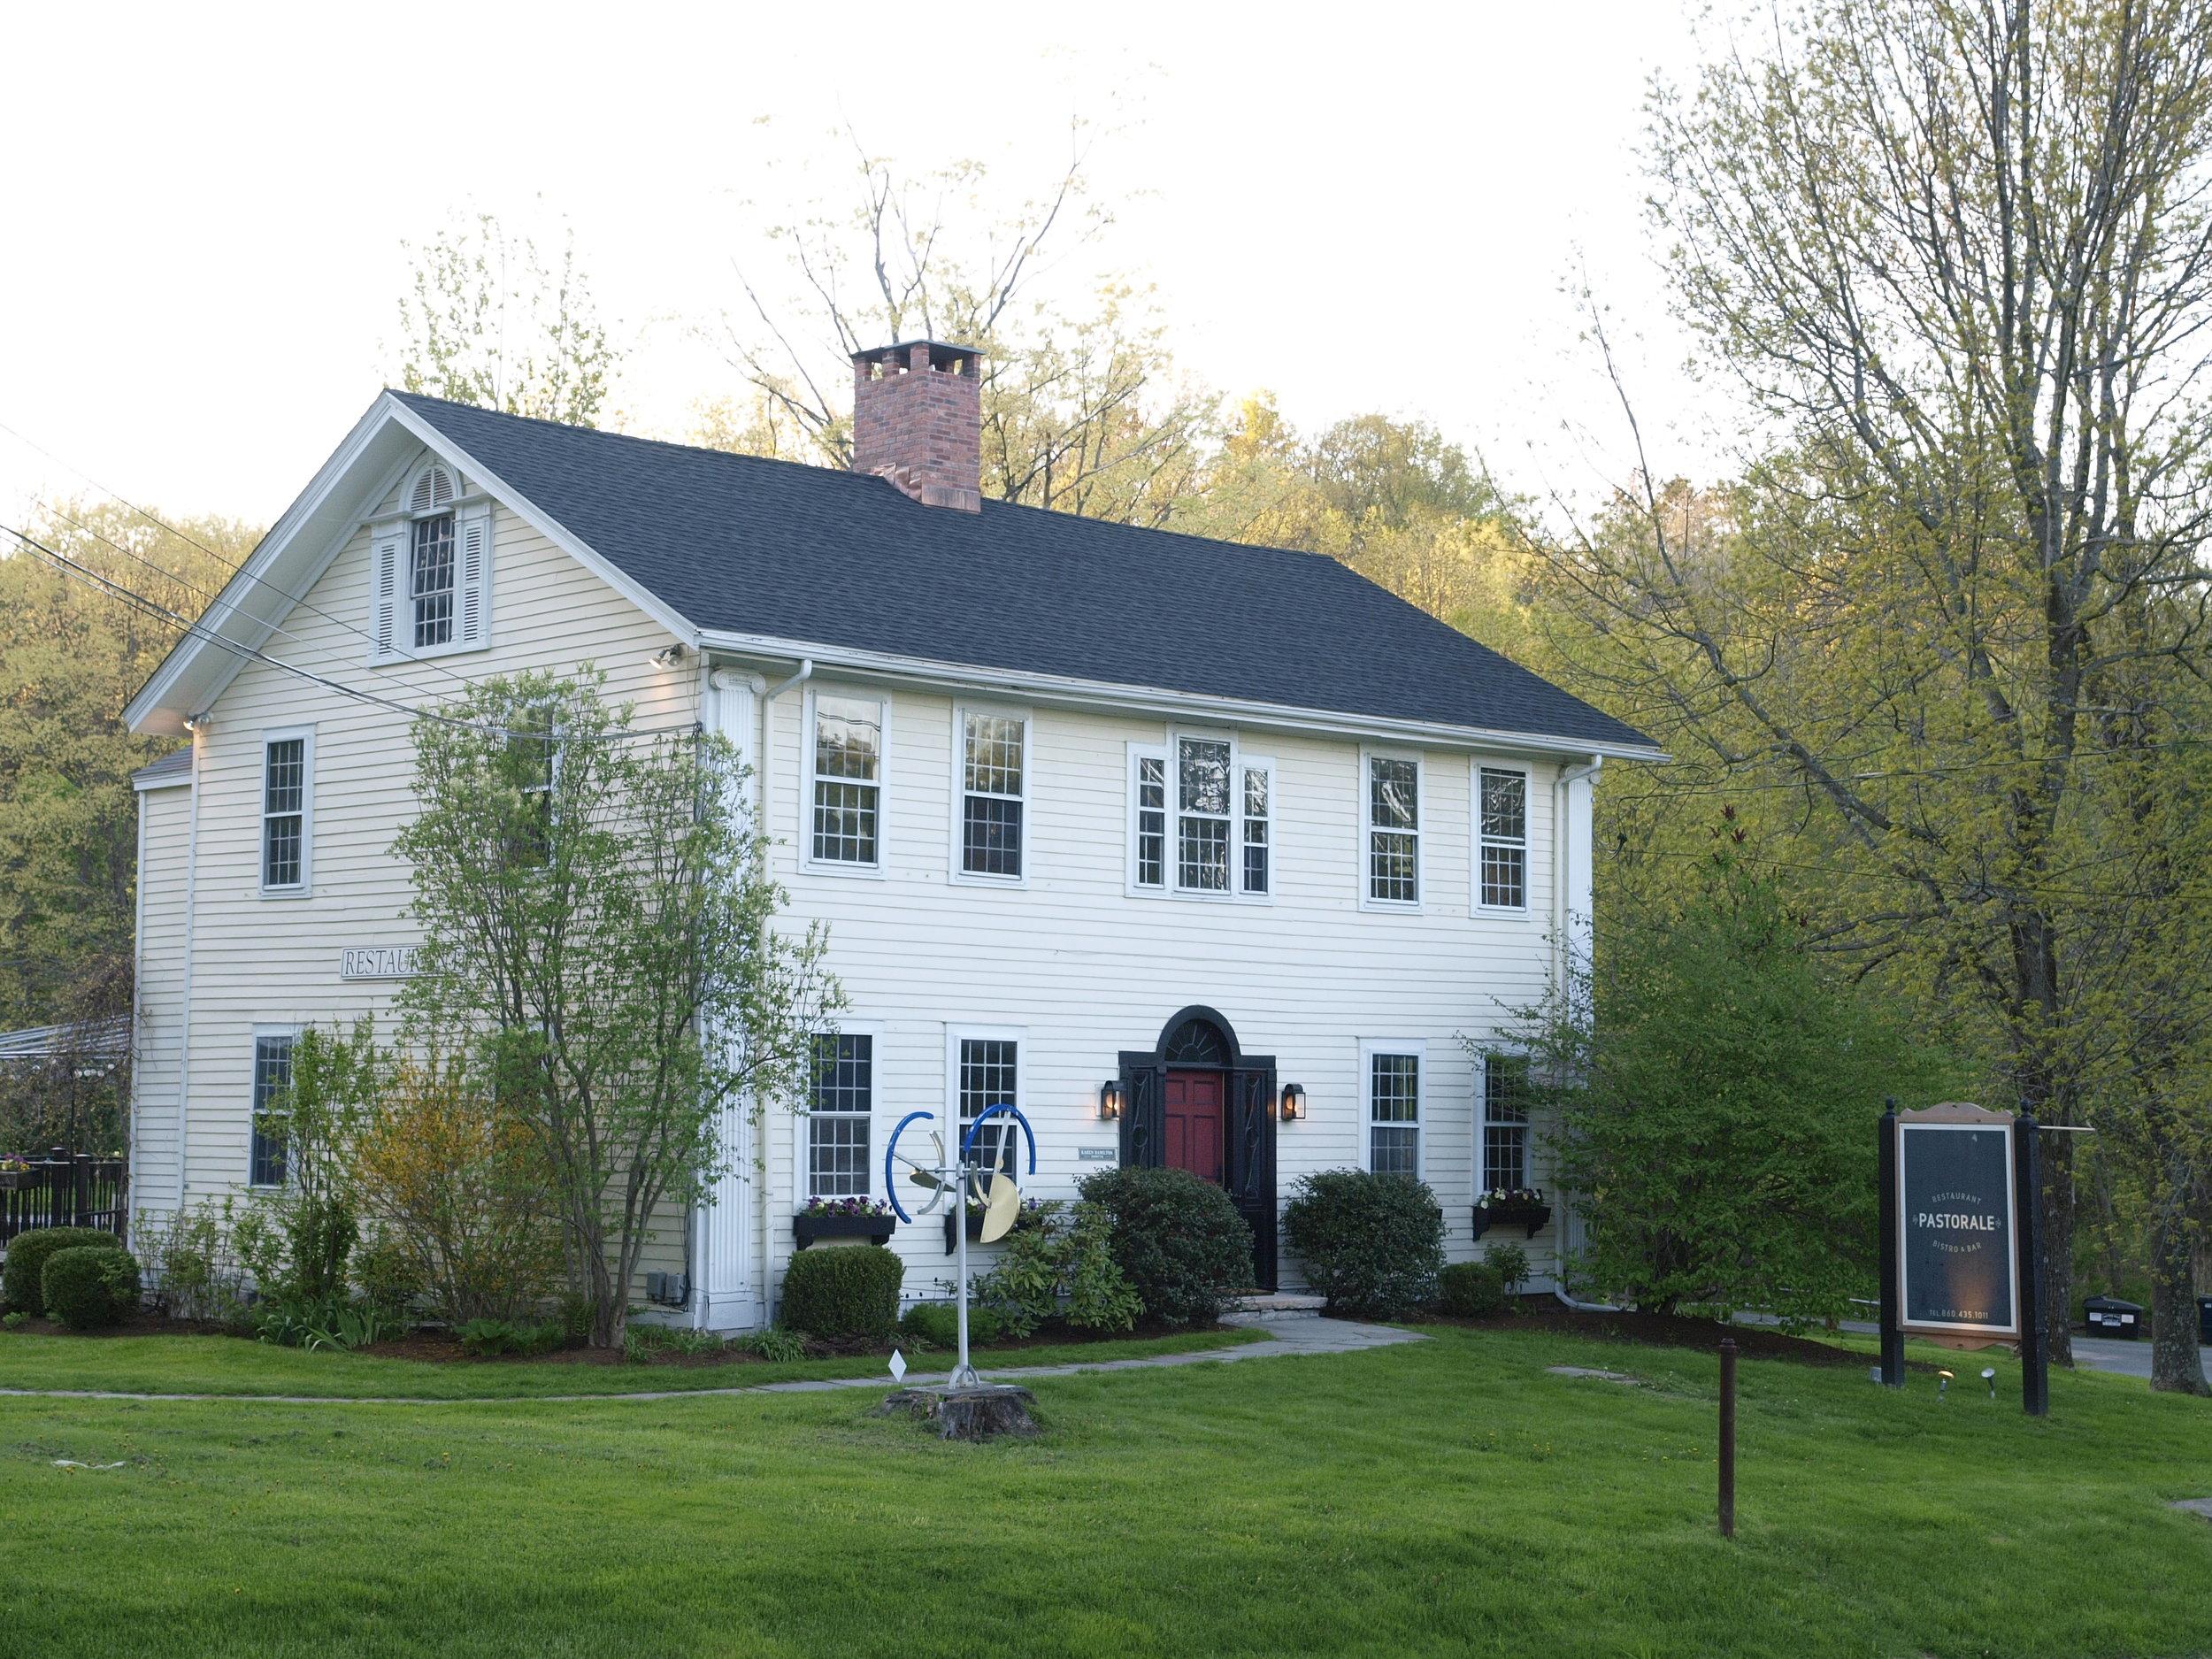 Lord-Haas House 1, 223 Main Street.JPG